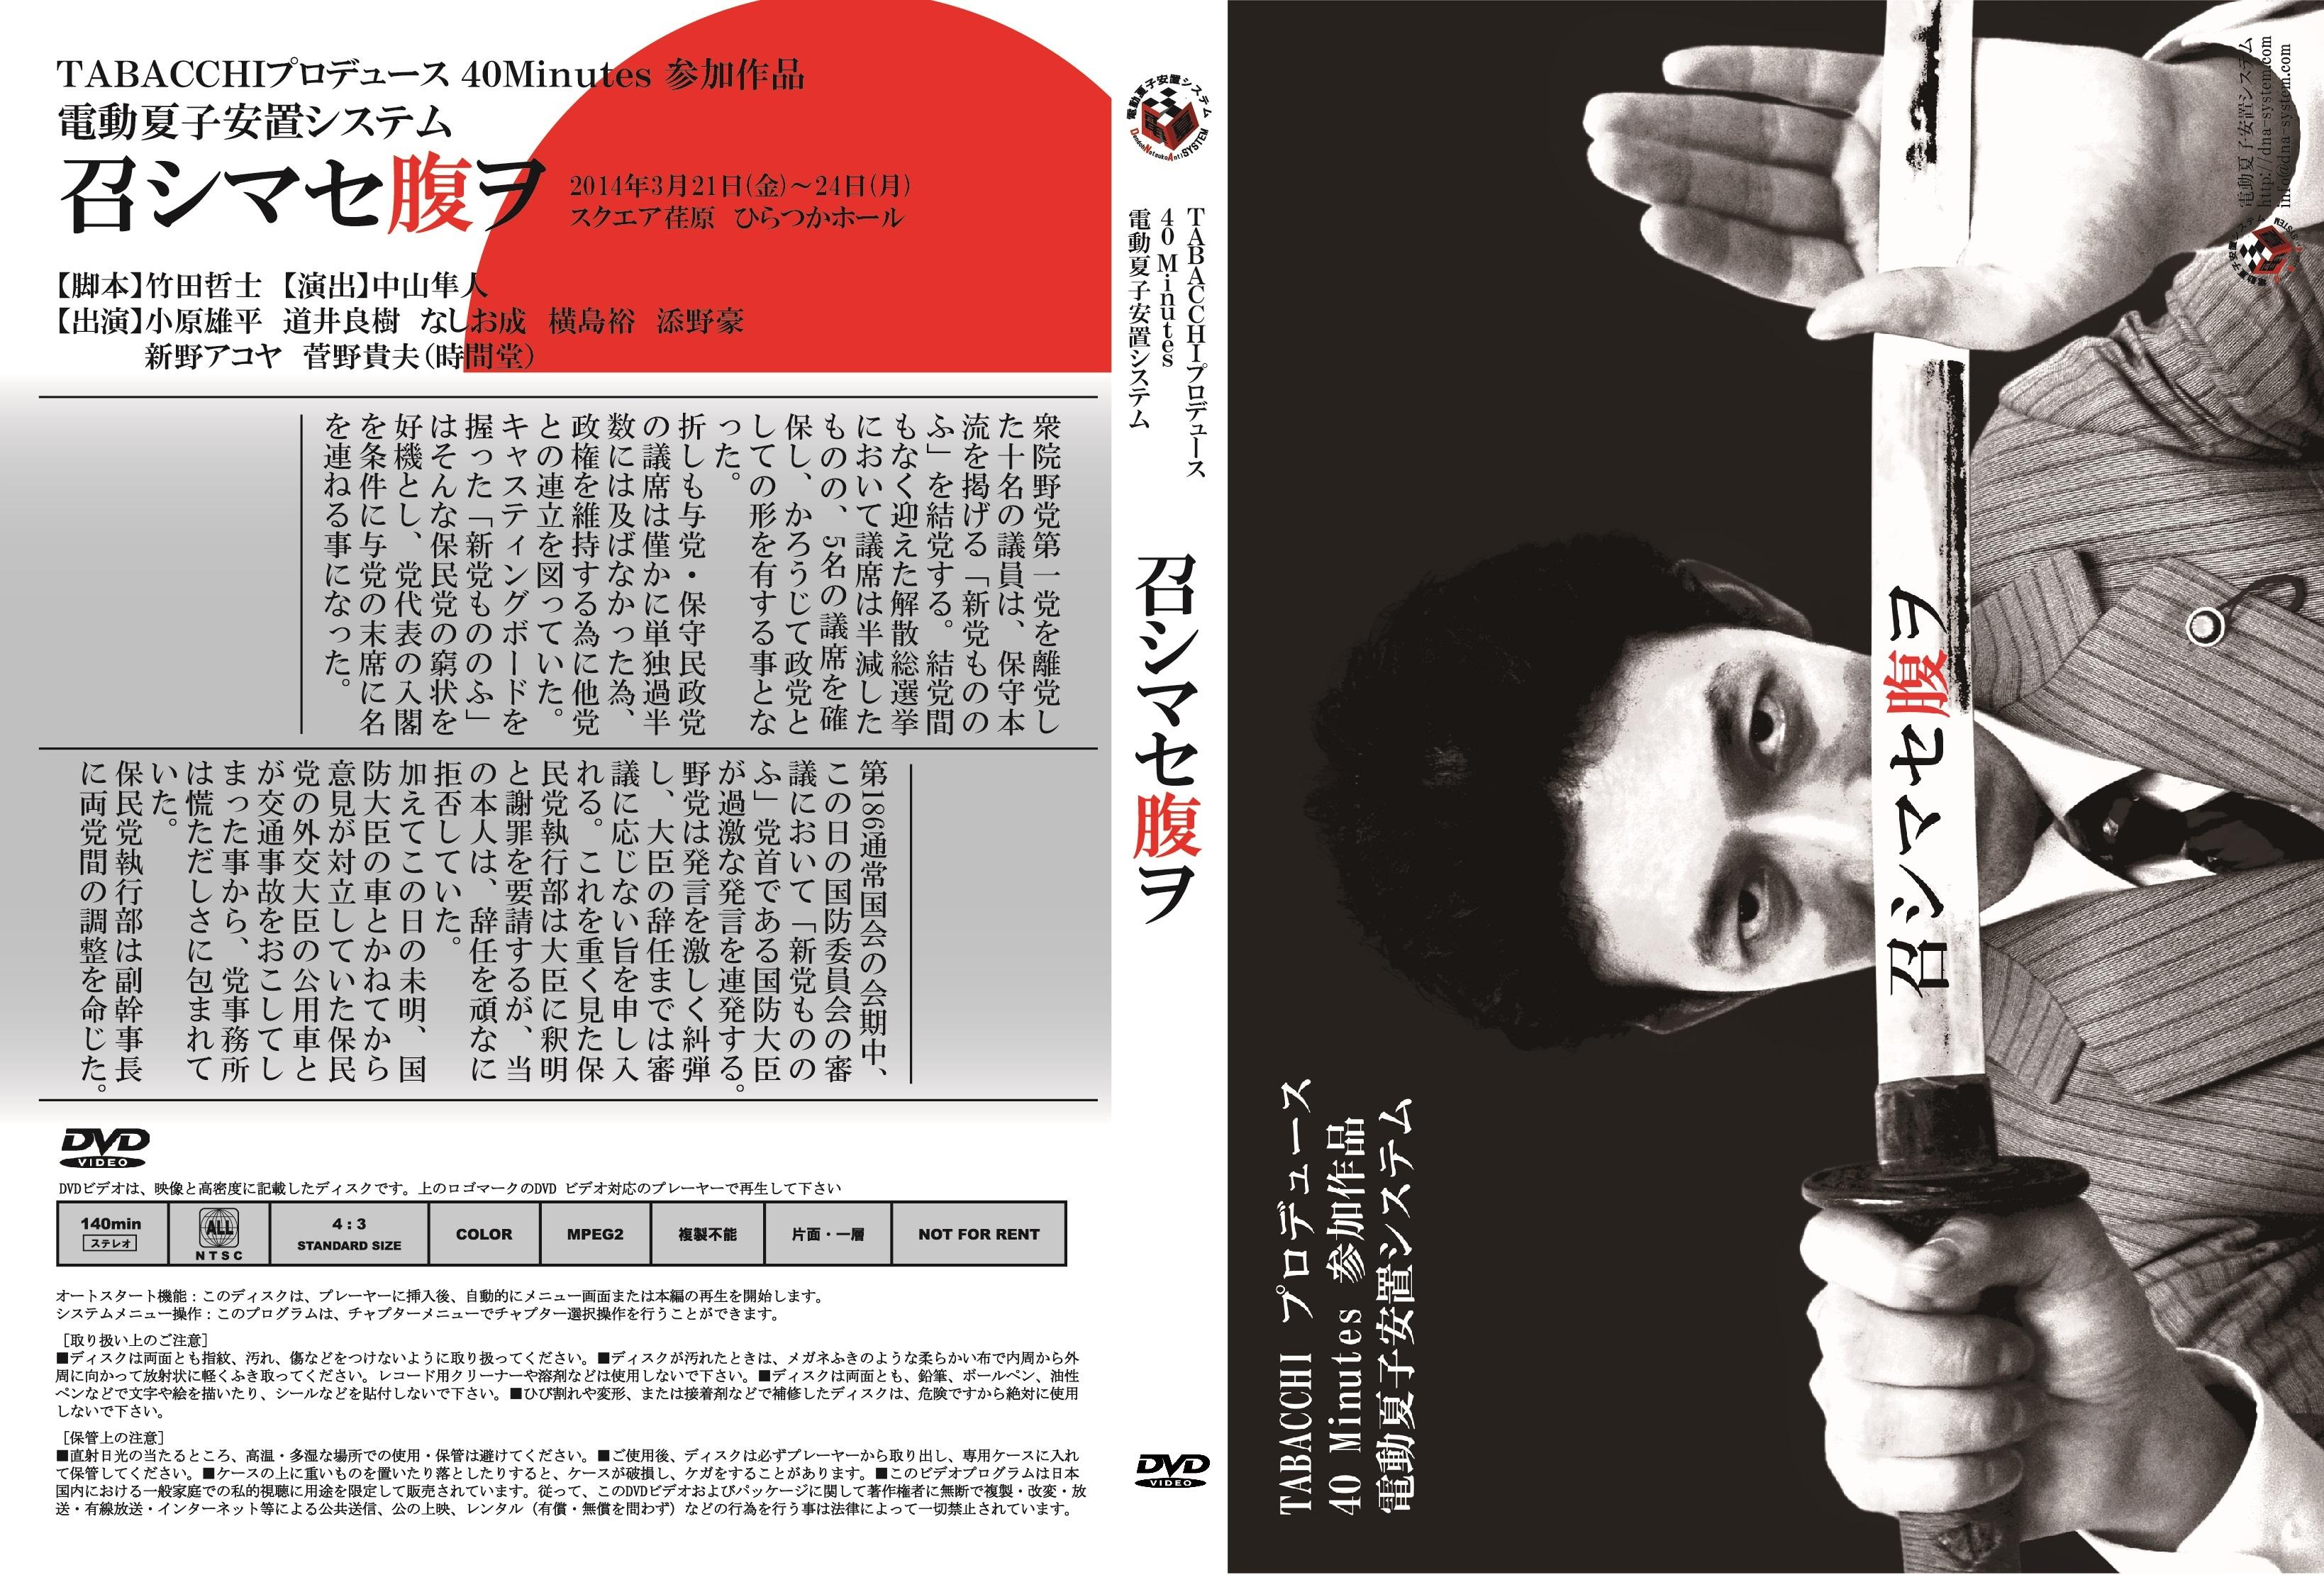 DVD 40Minutes 『召シマセ腹ヲ』